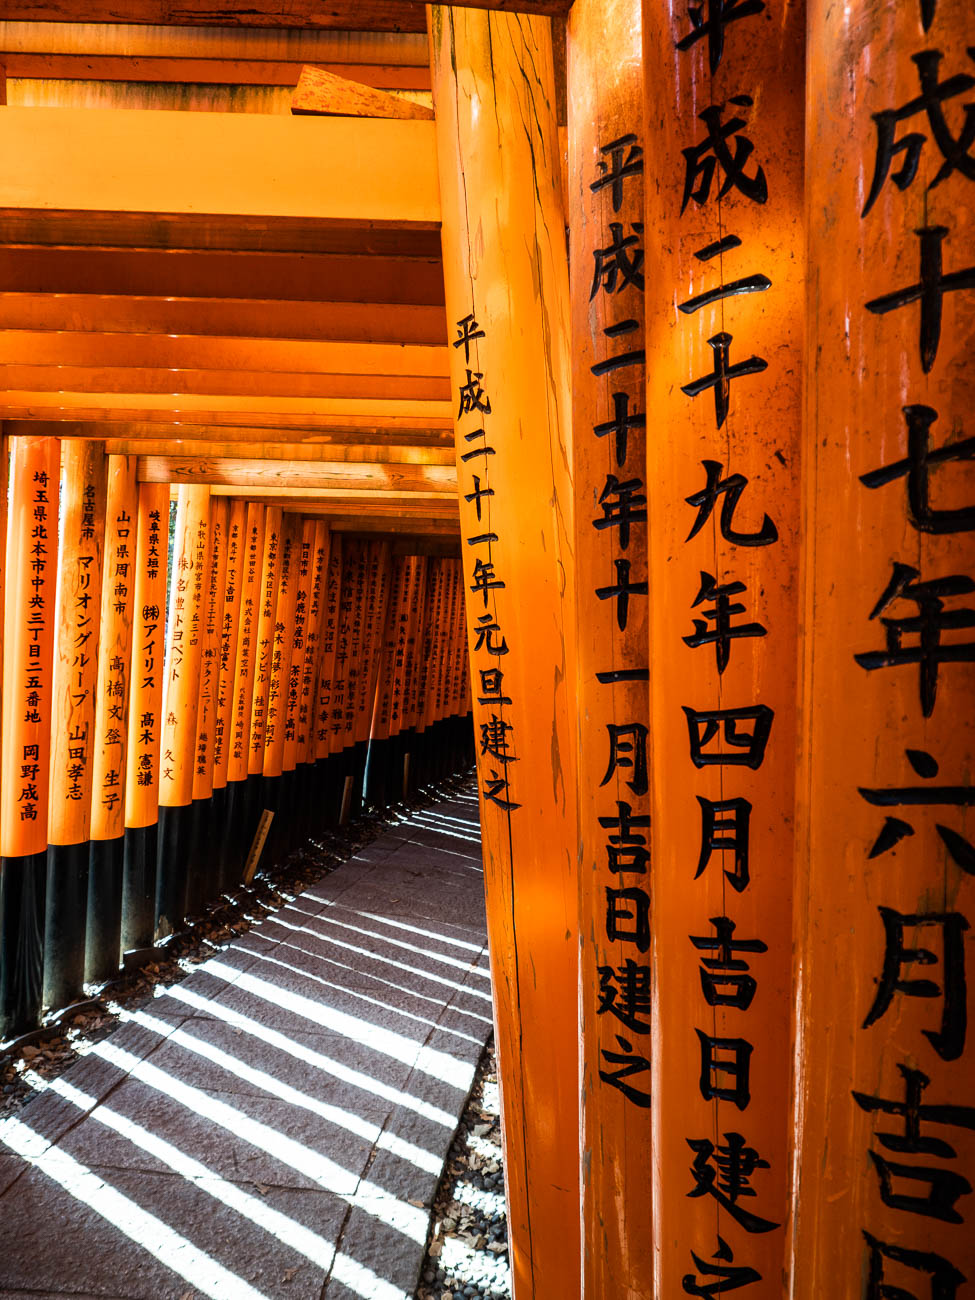 Torii shrine gates at the Fushimi Inari-Taisha complex in Kyoto, Japan